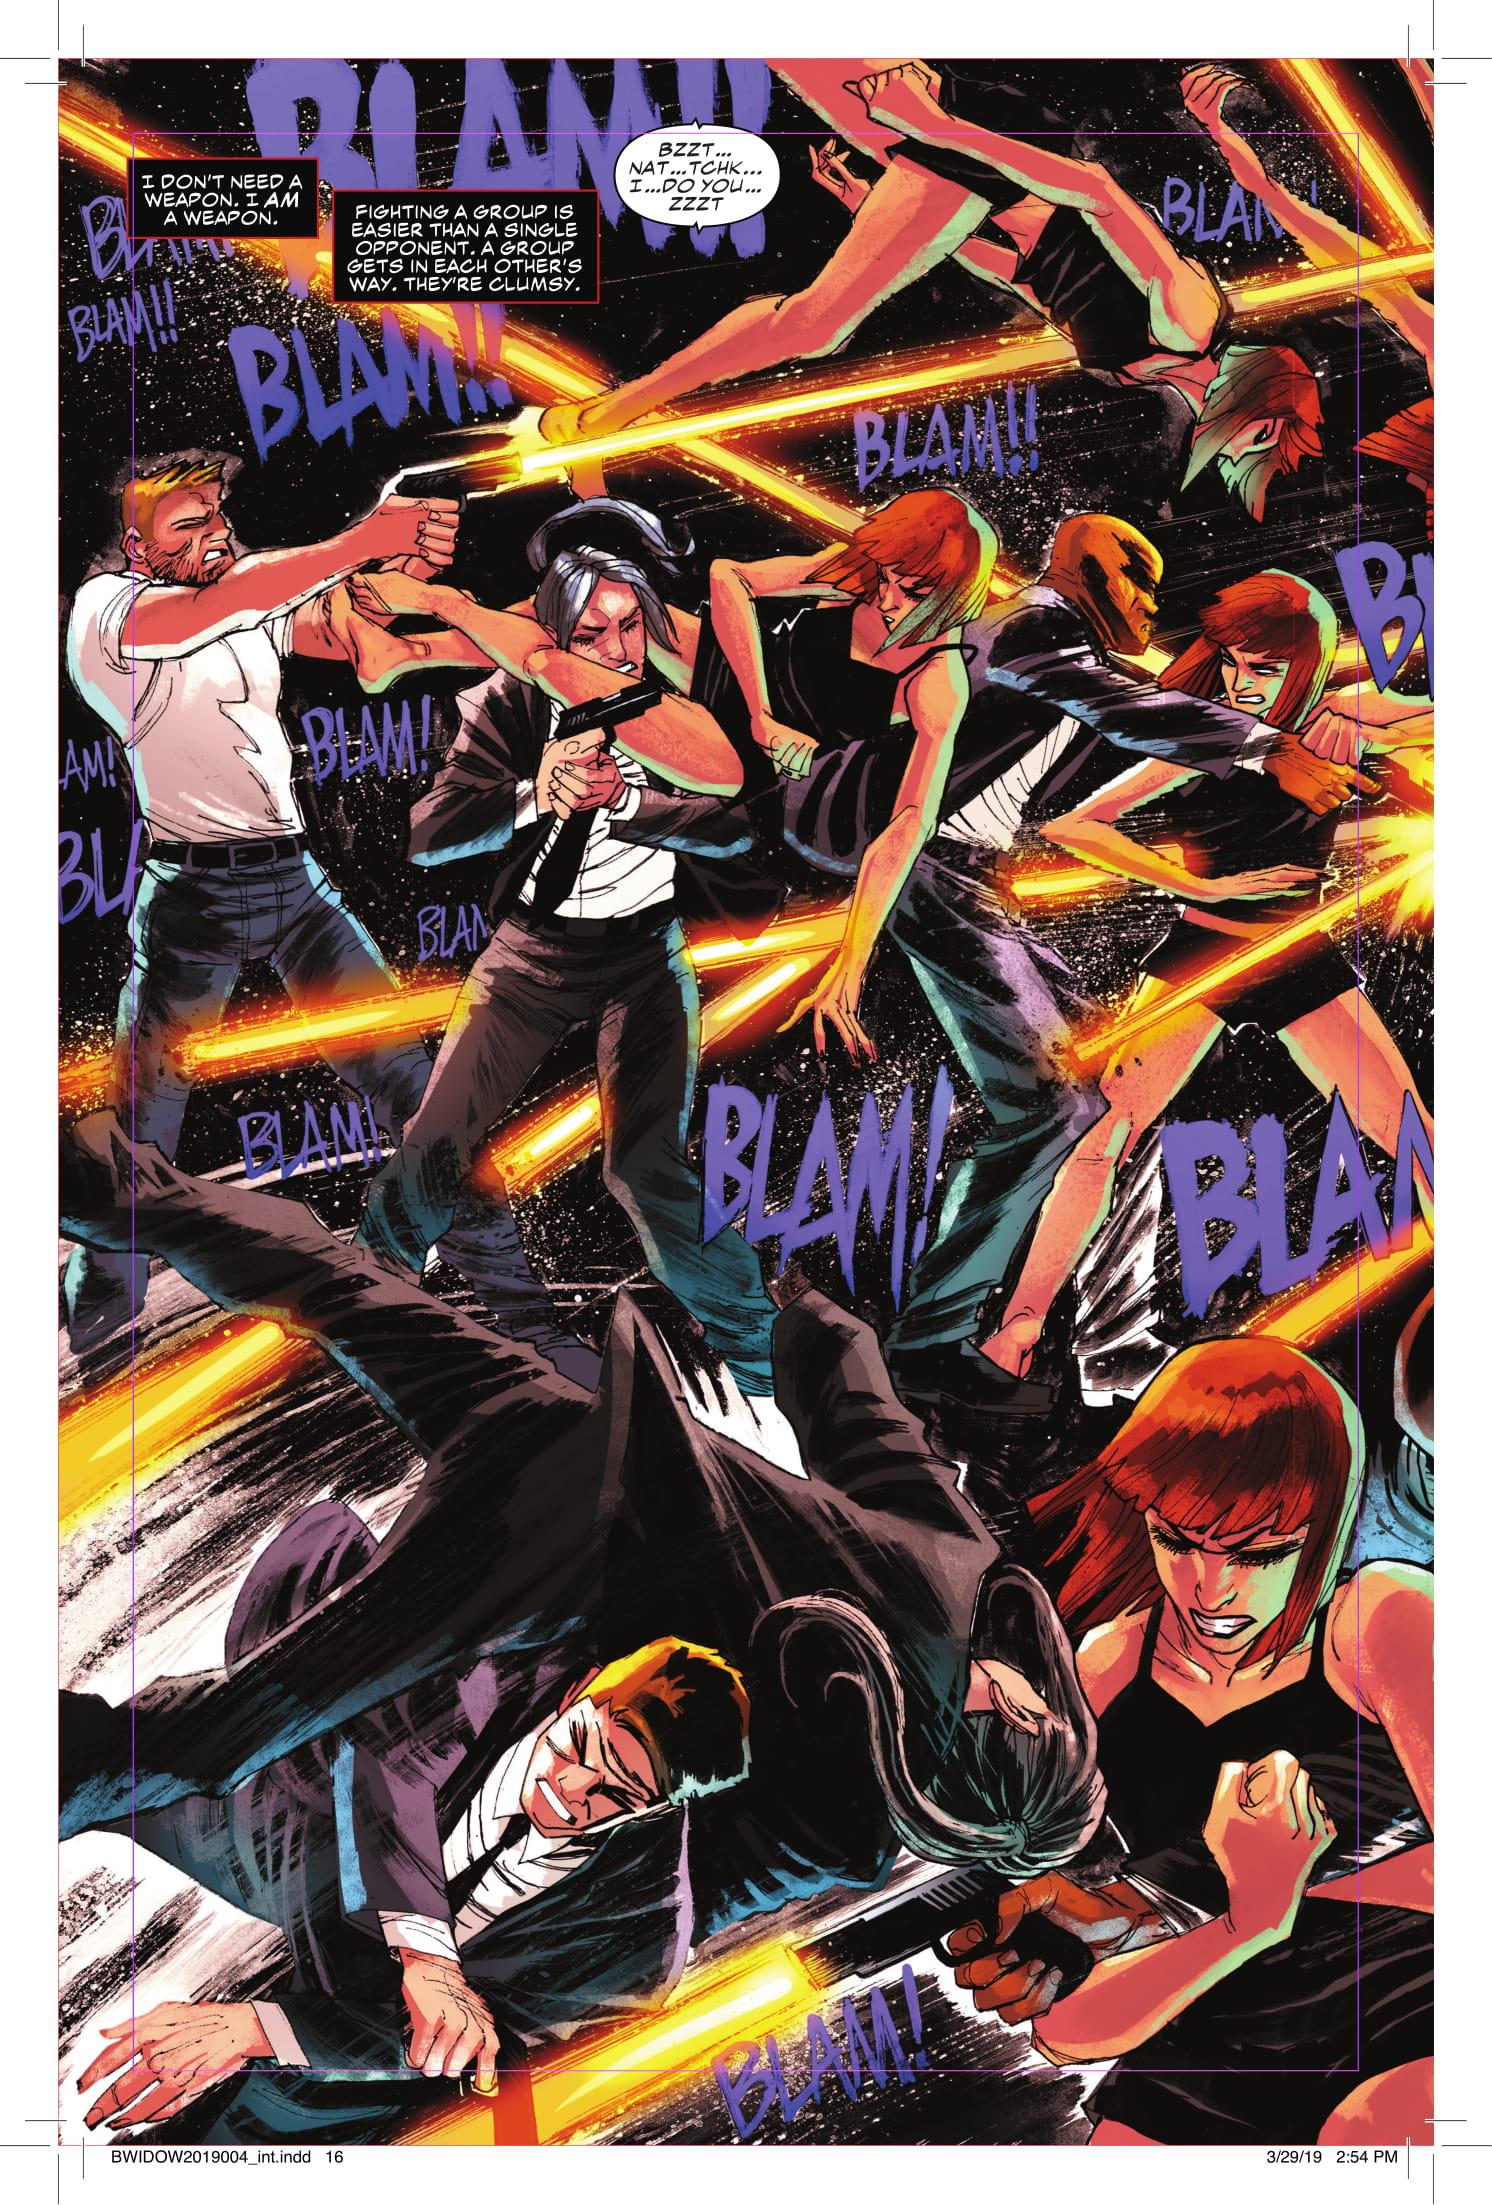 Black Widow #4 page 3